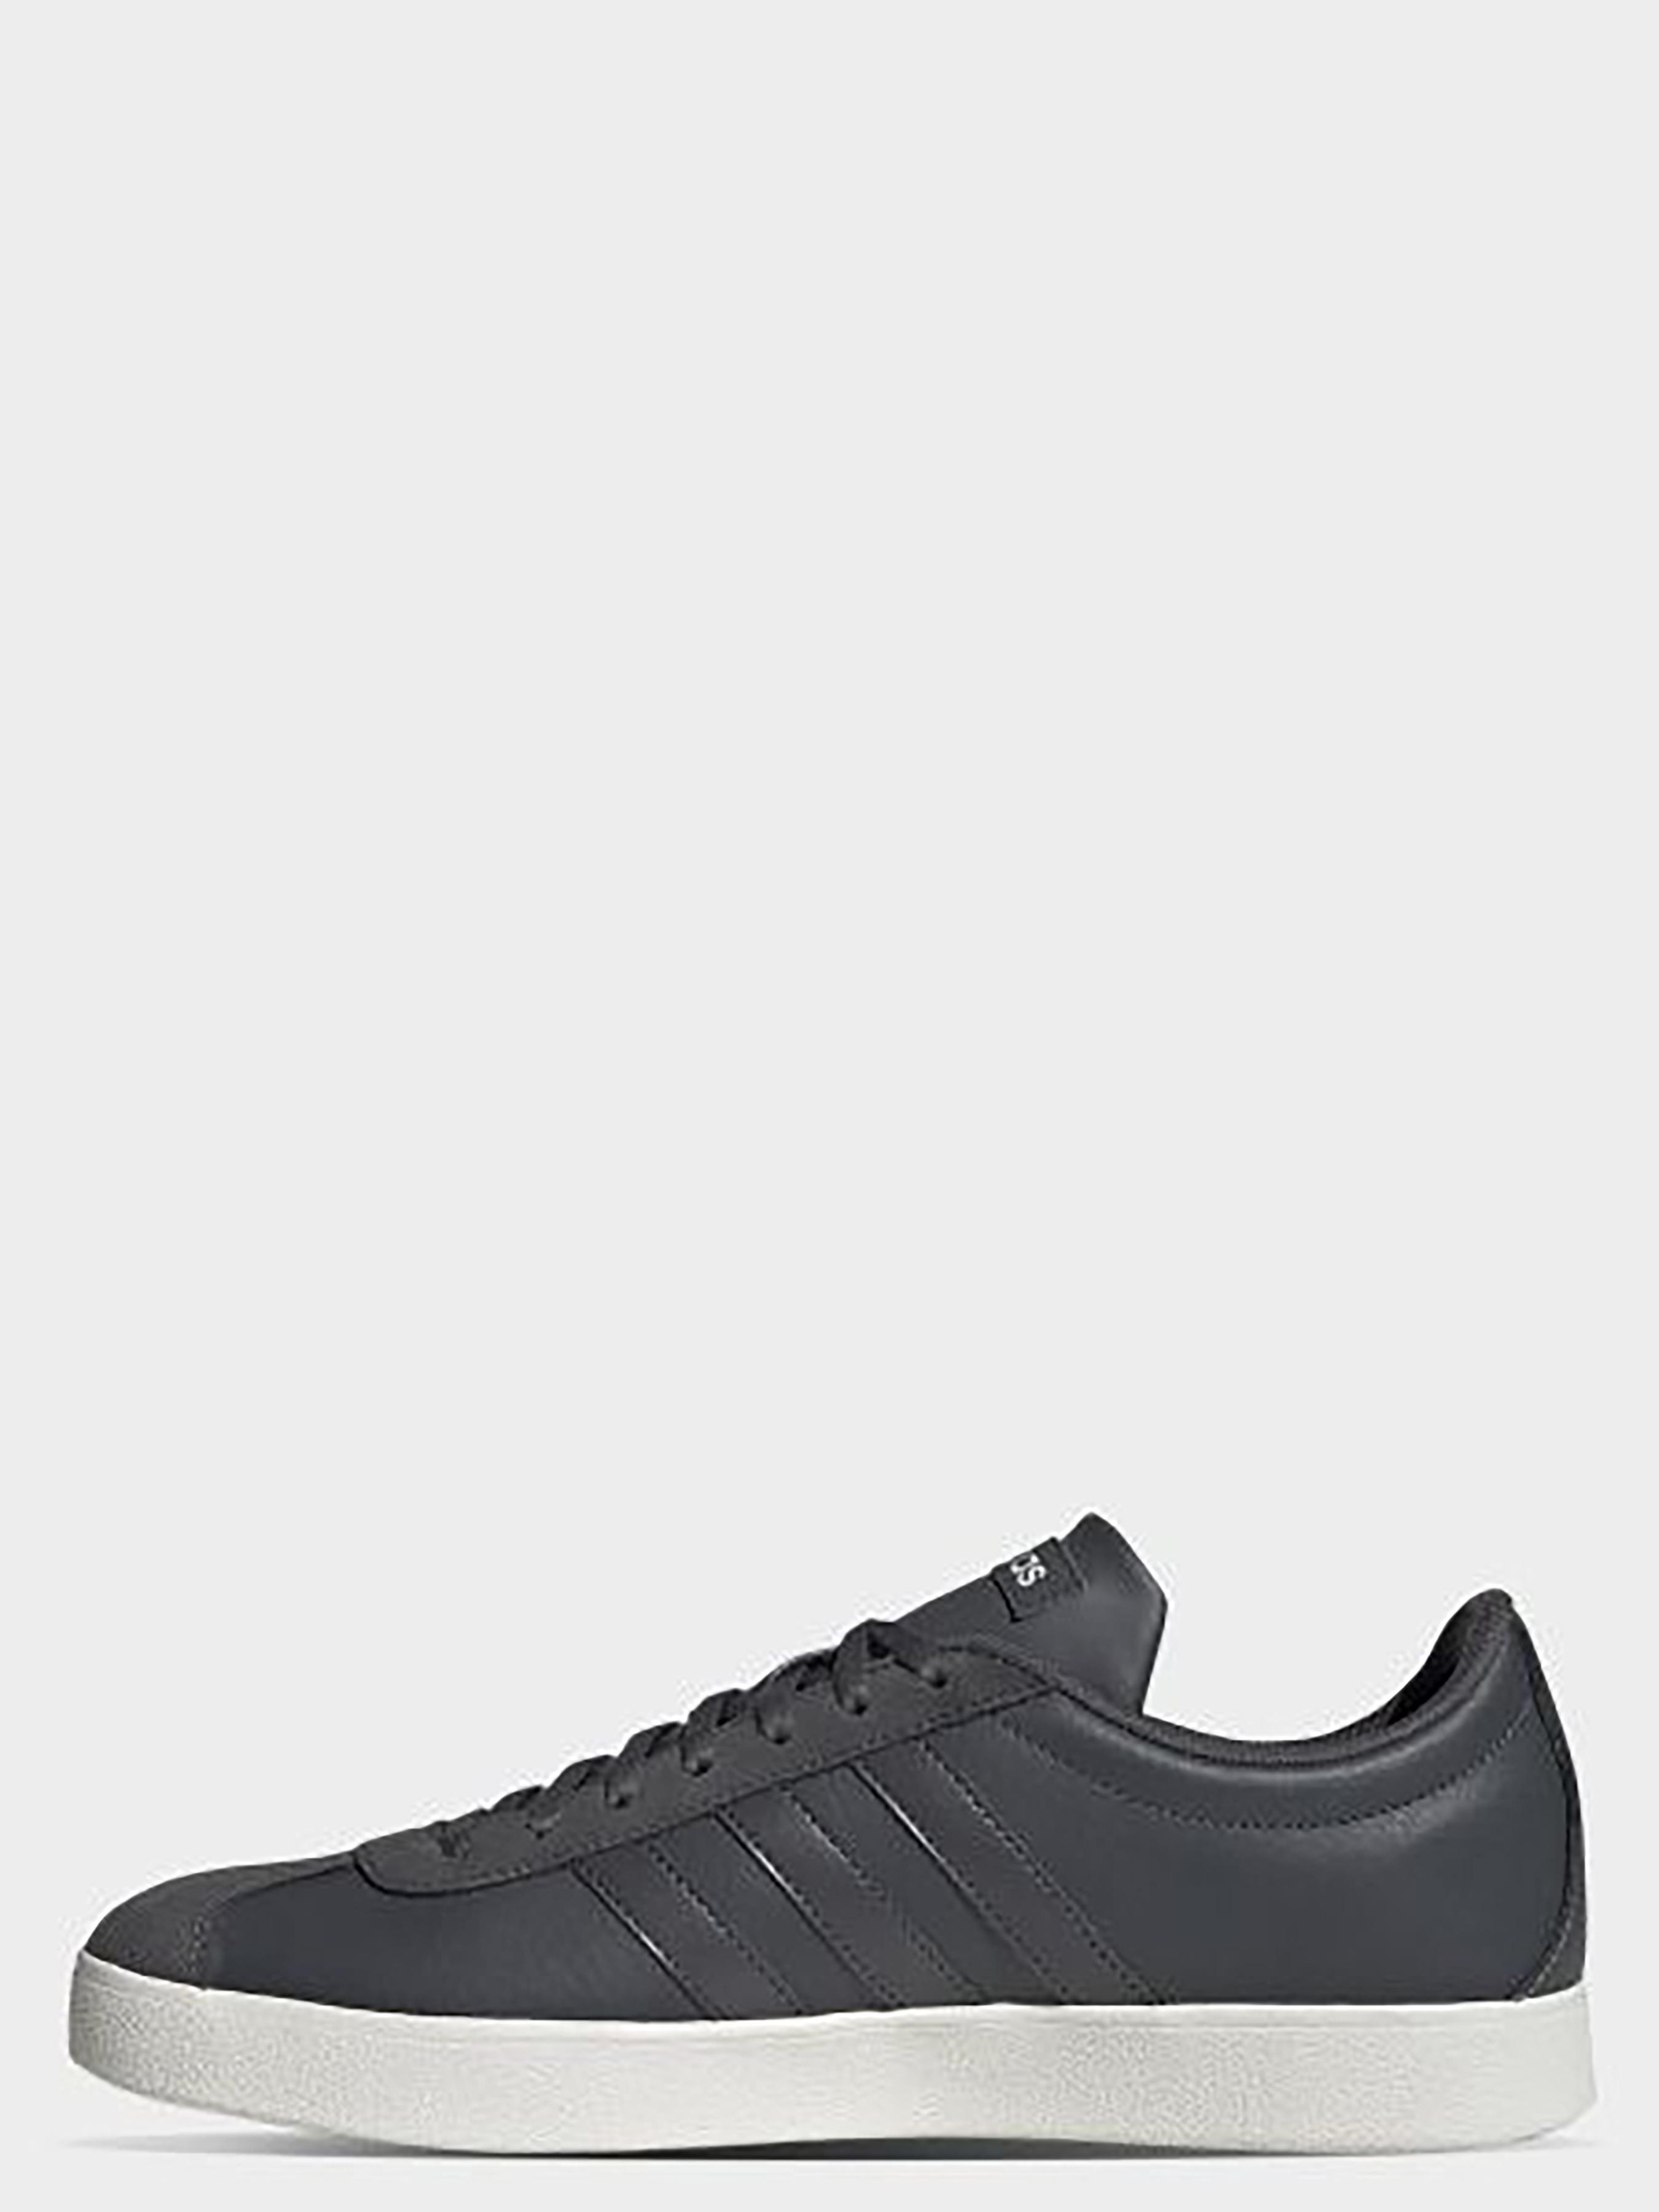 Кеды мужские Adidas VL COURT 2.0 CN137 , 2017